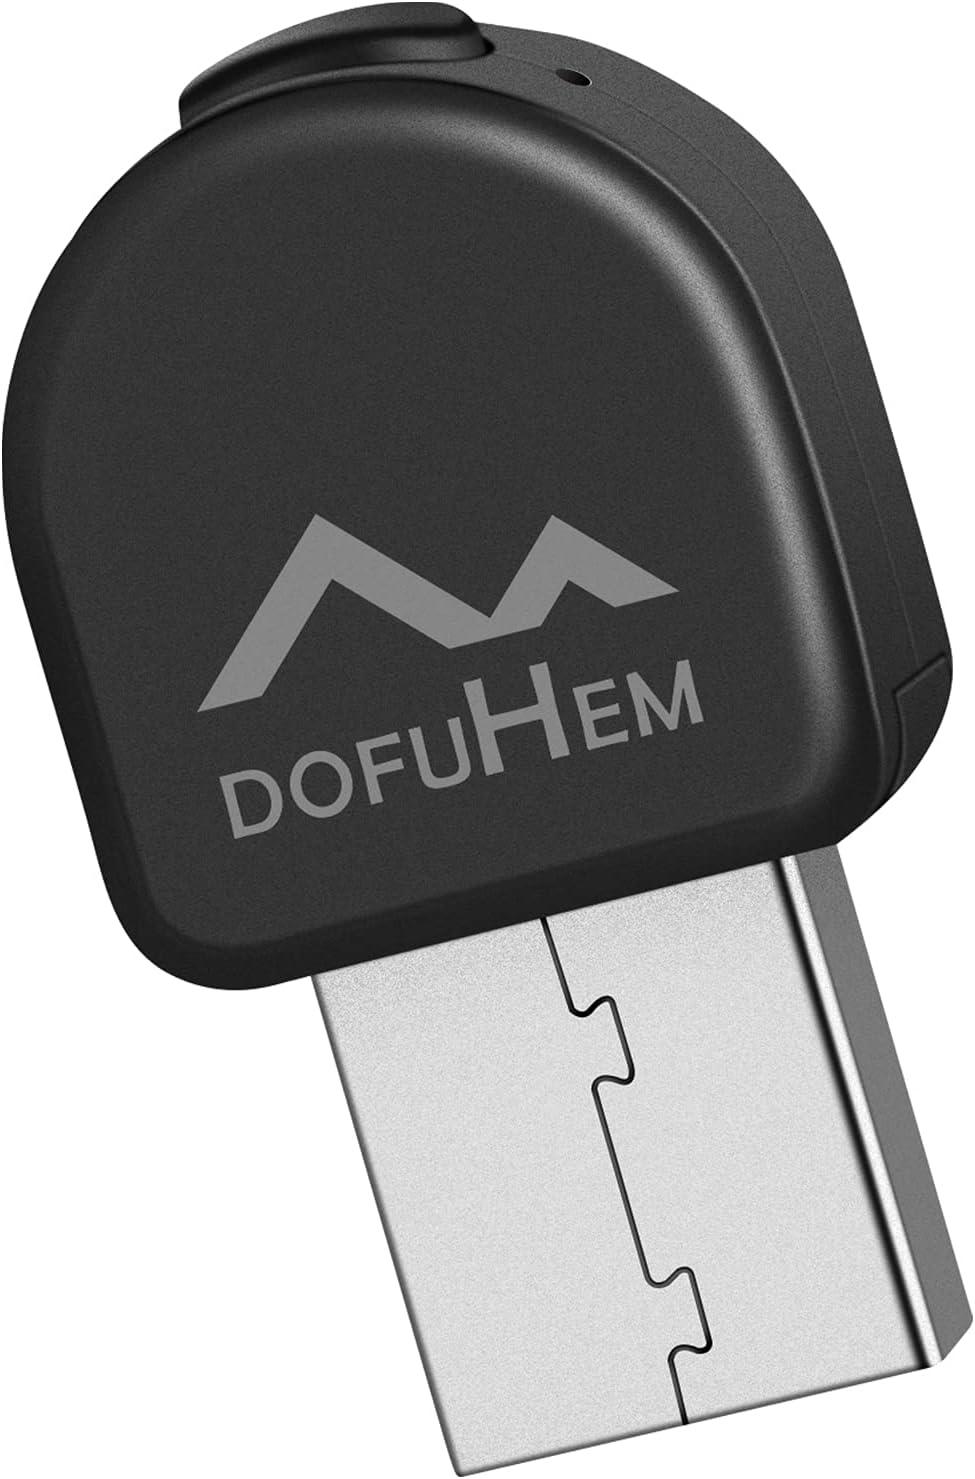 Dofuhem   3 Modes USB Mouse Jiggler  $8.49 Coupon